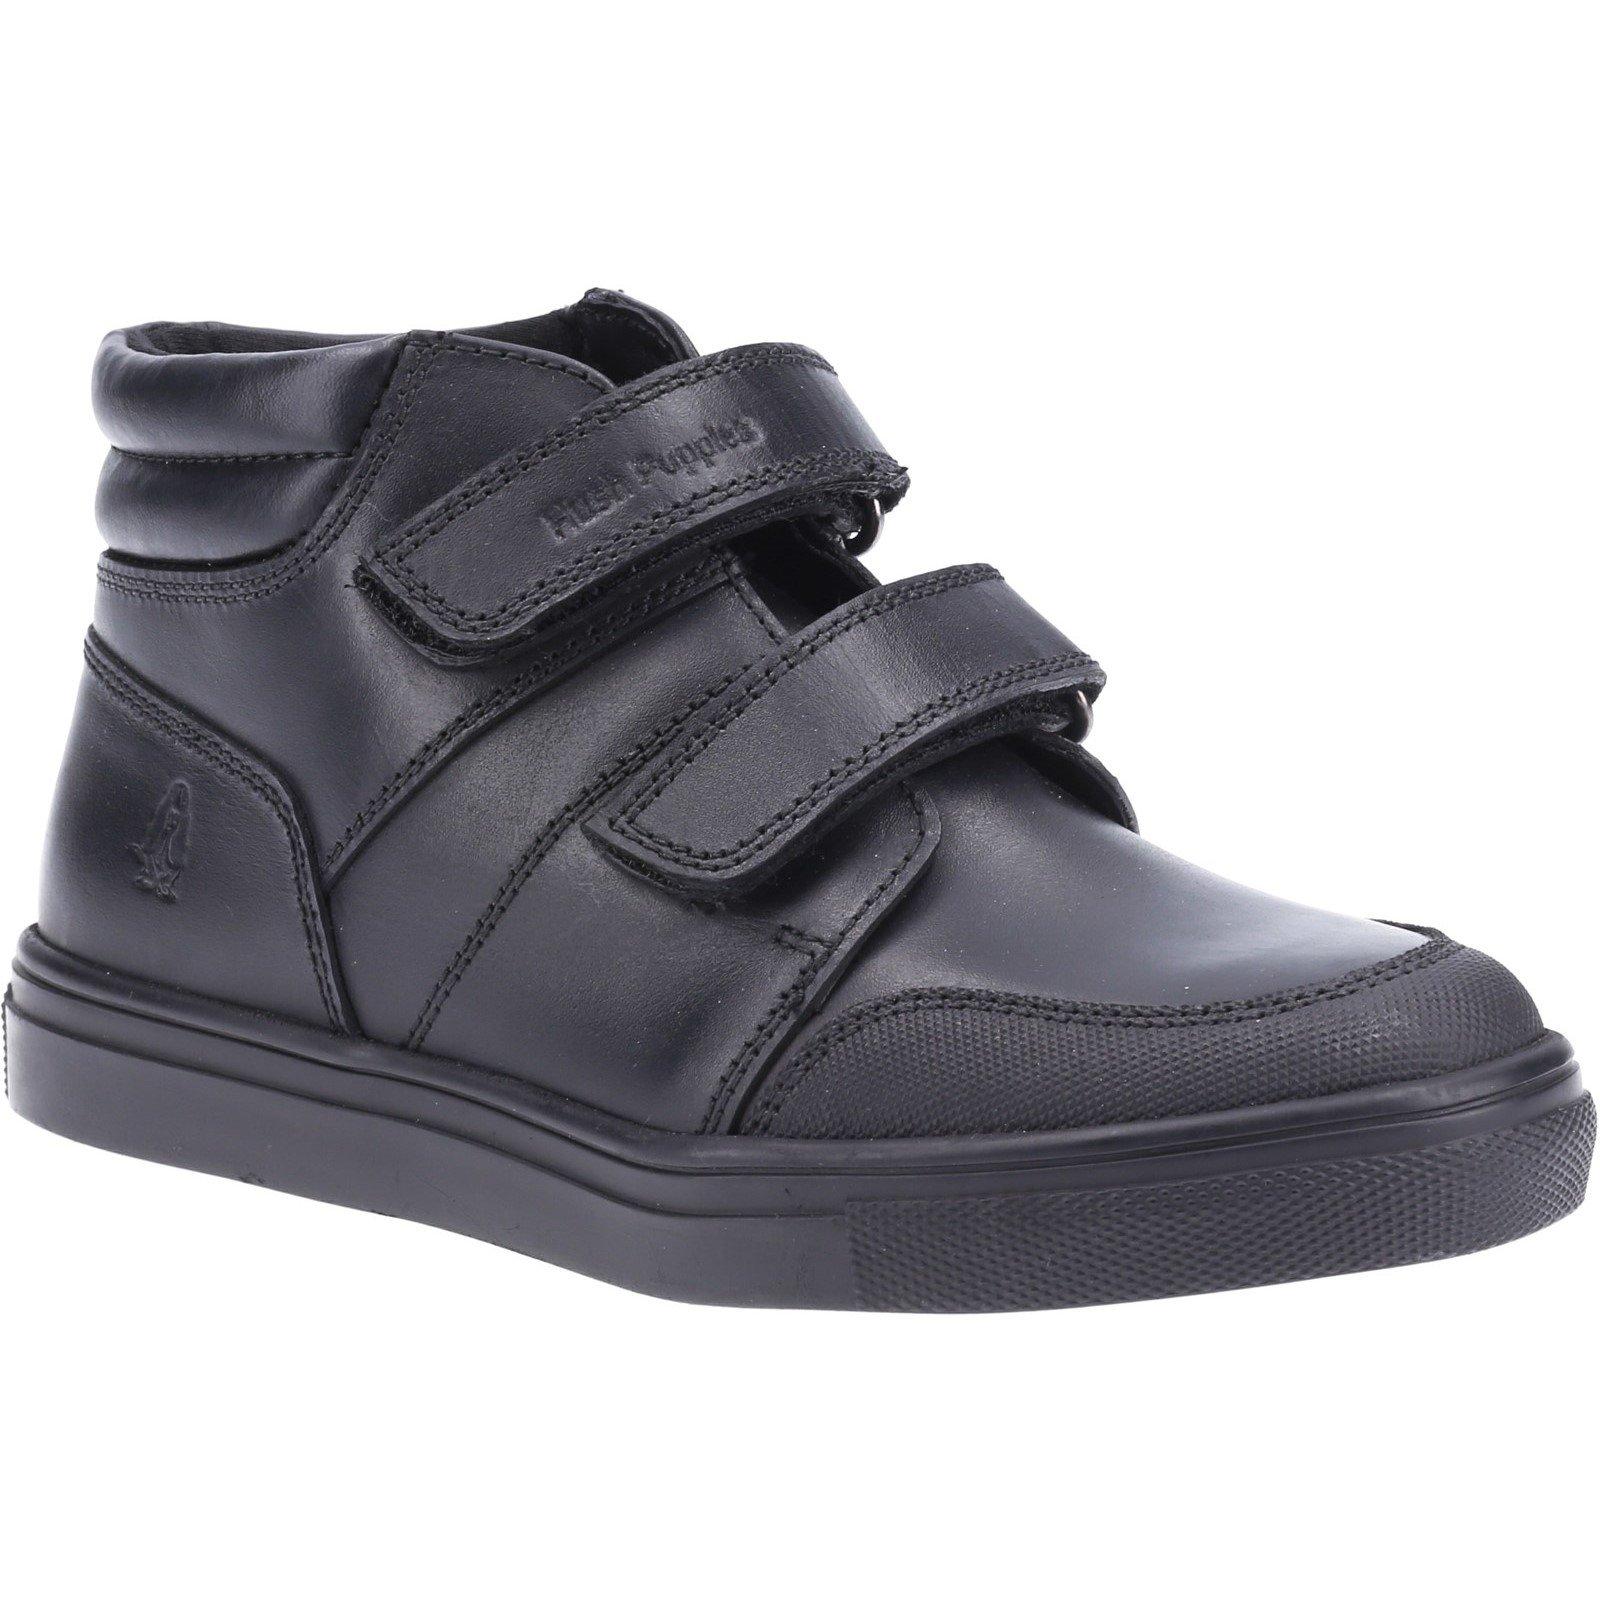 Hush Puppies Kid's Seth Junior Boot Black 32570 - Black 12